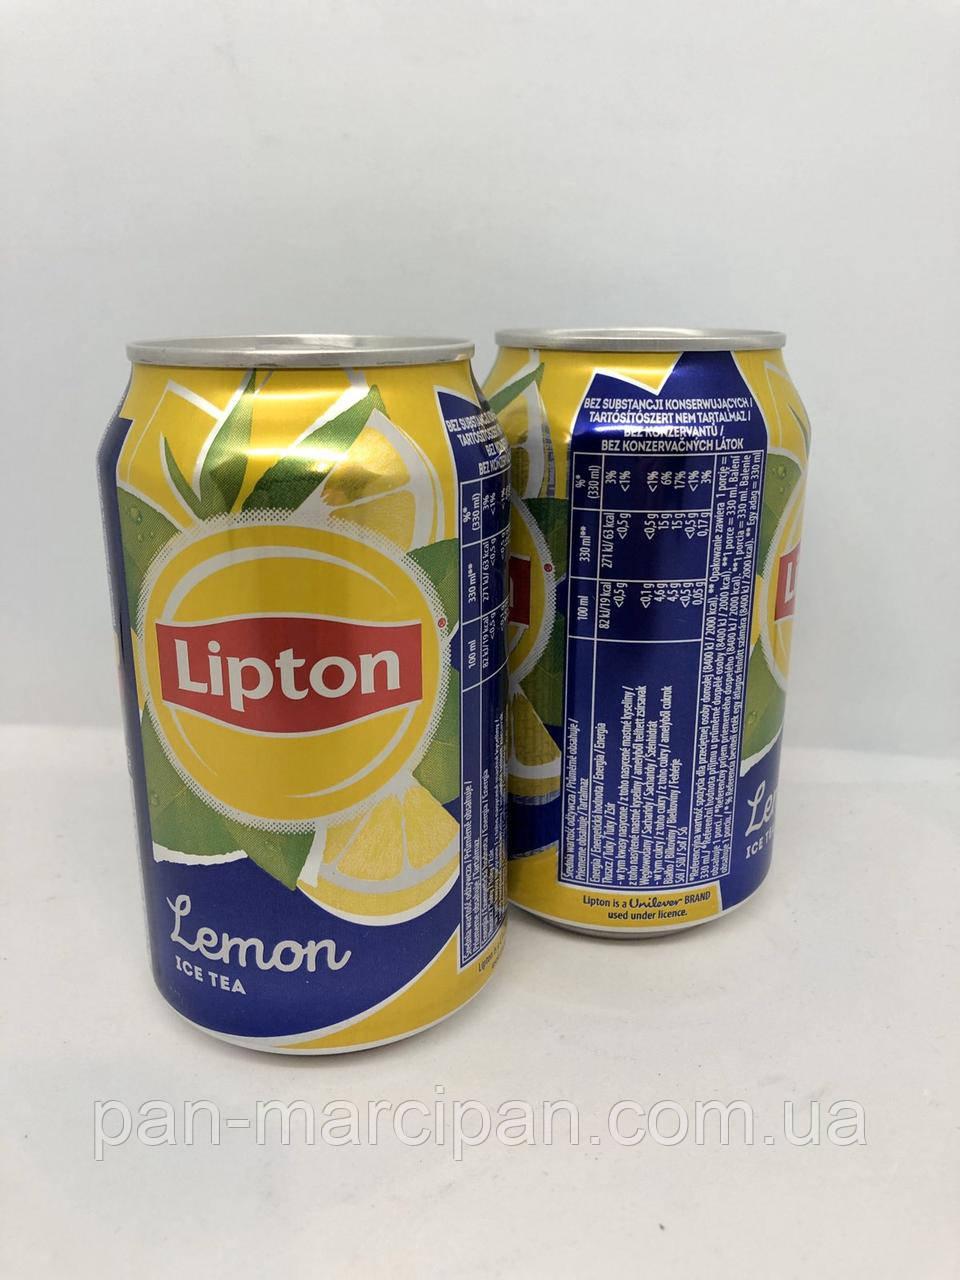 Чай Lipton Lemon Ice Tea ж/б 330ml Польща